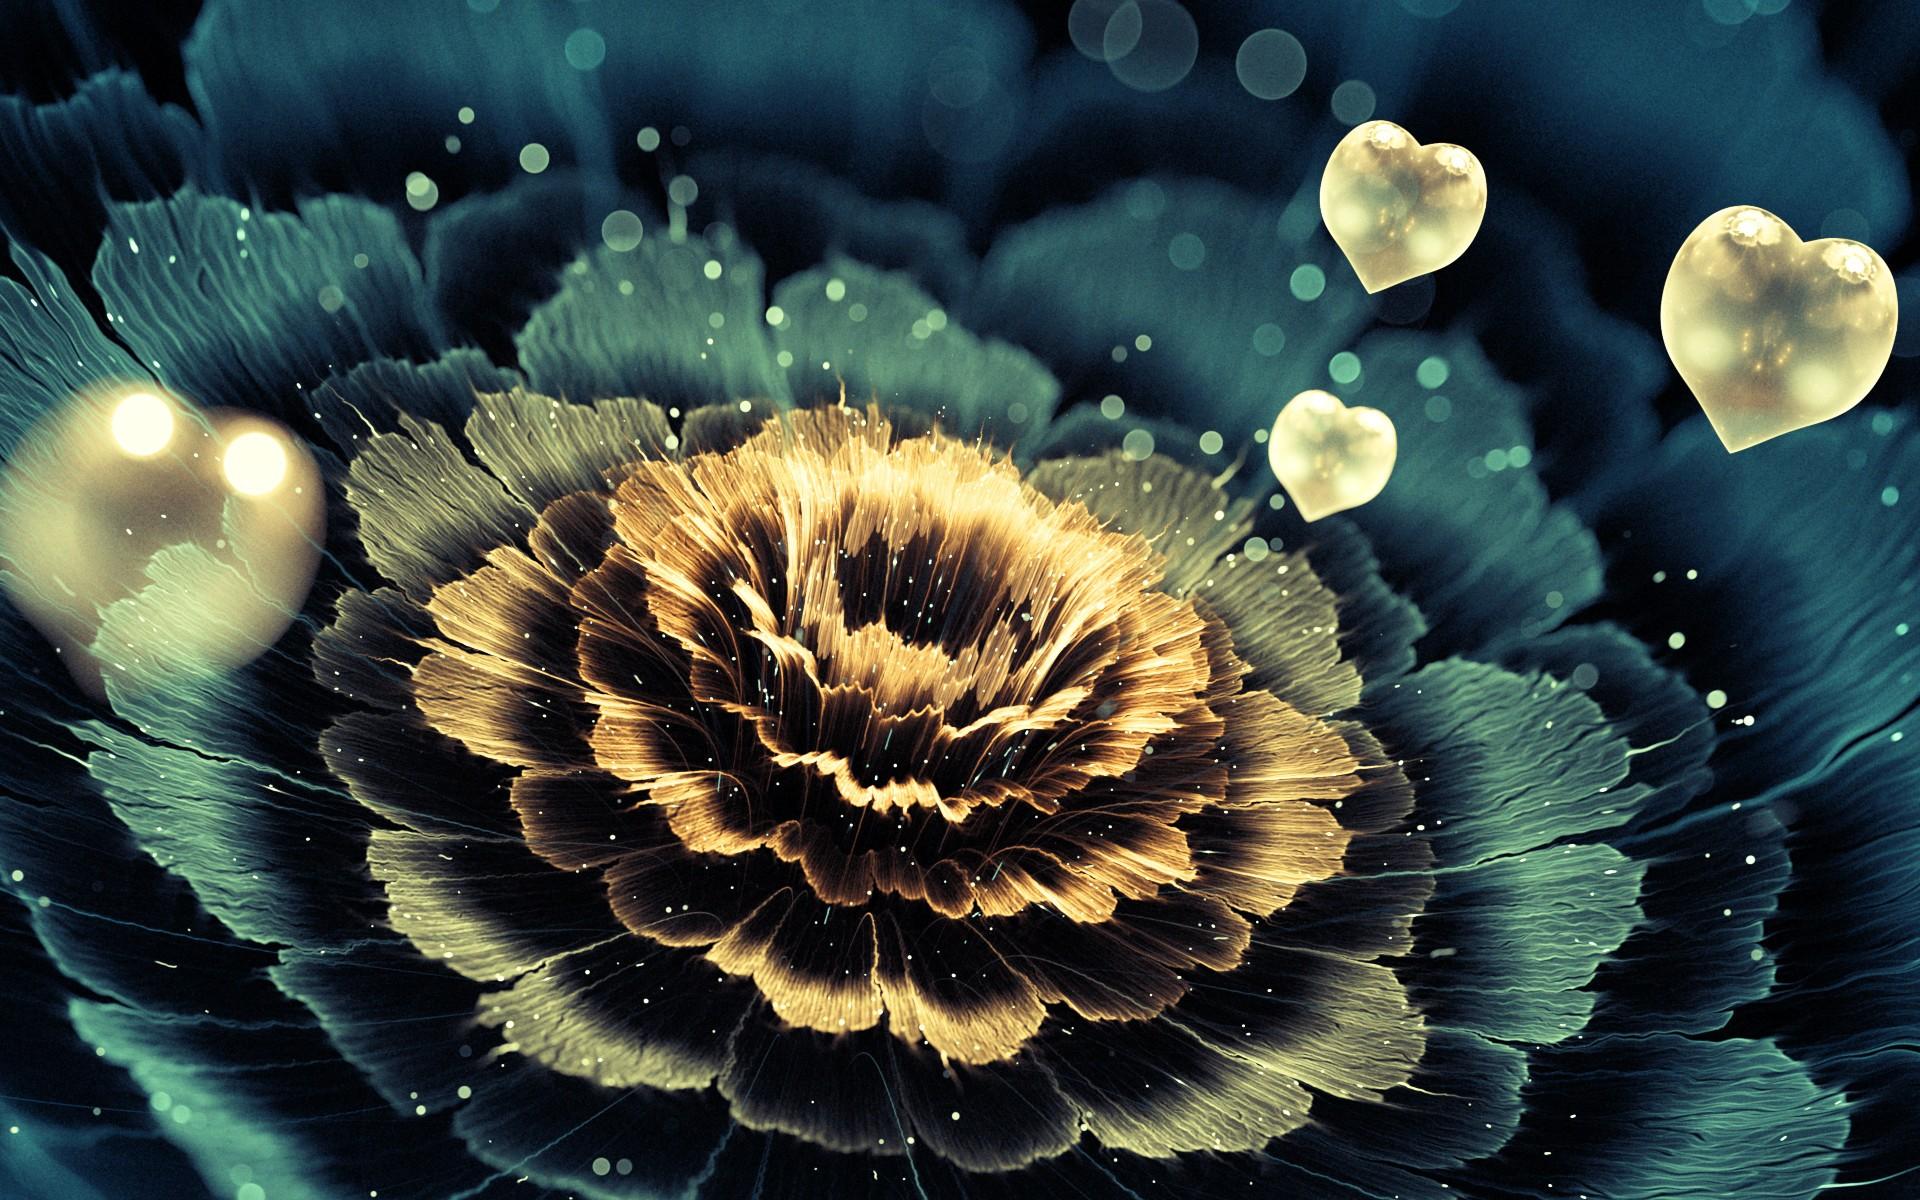 digital art flowers nature love heart photography fractal petals 3D fractal leaf flower plant flora petal computer wallpaper land plant flowering plant fractal art close up macro photography 47313